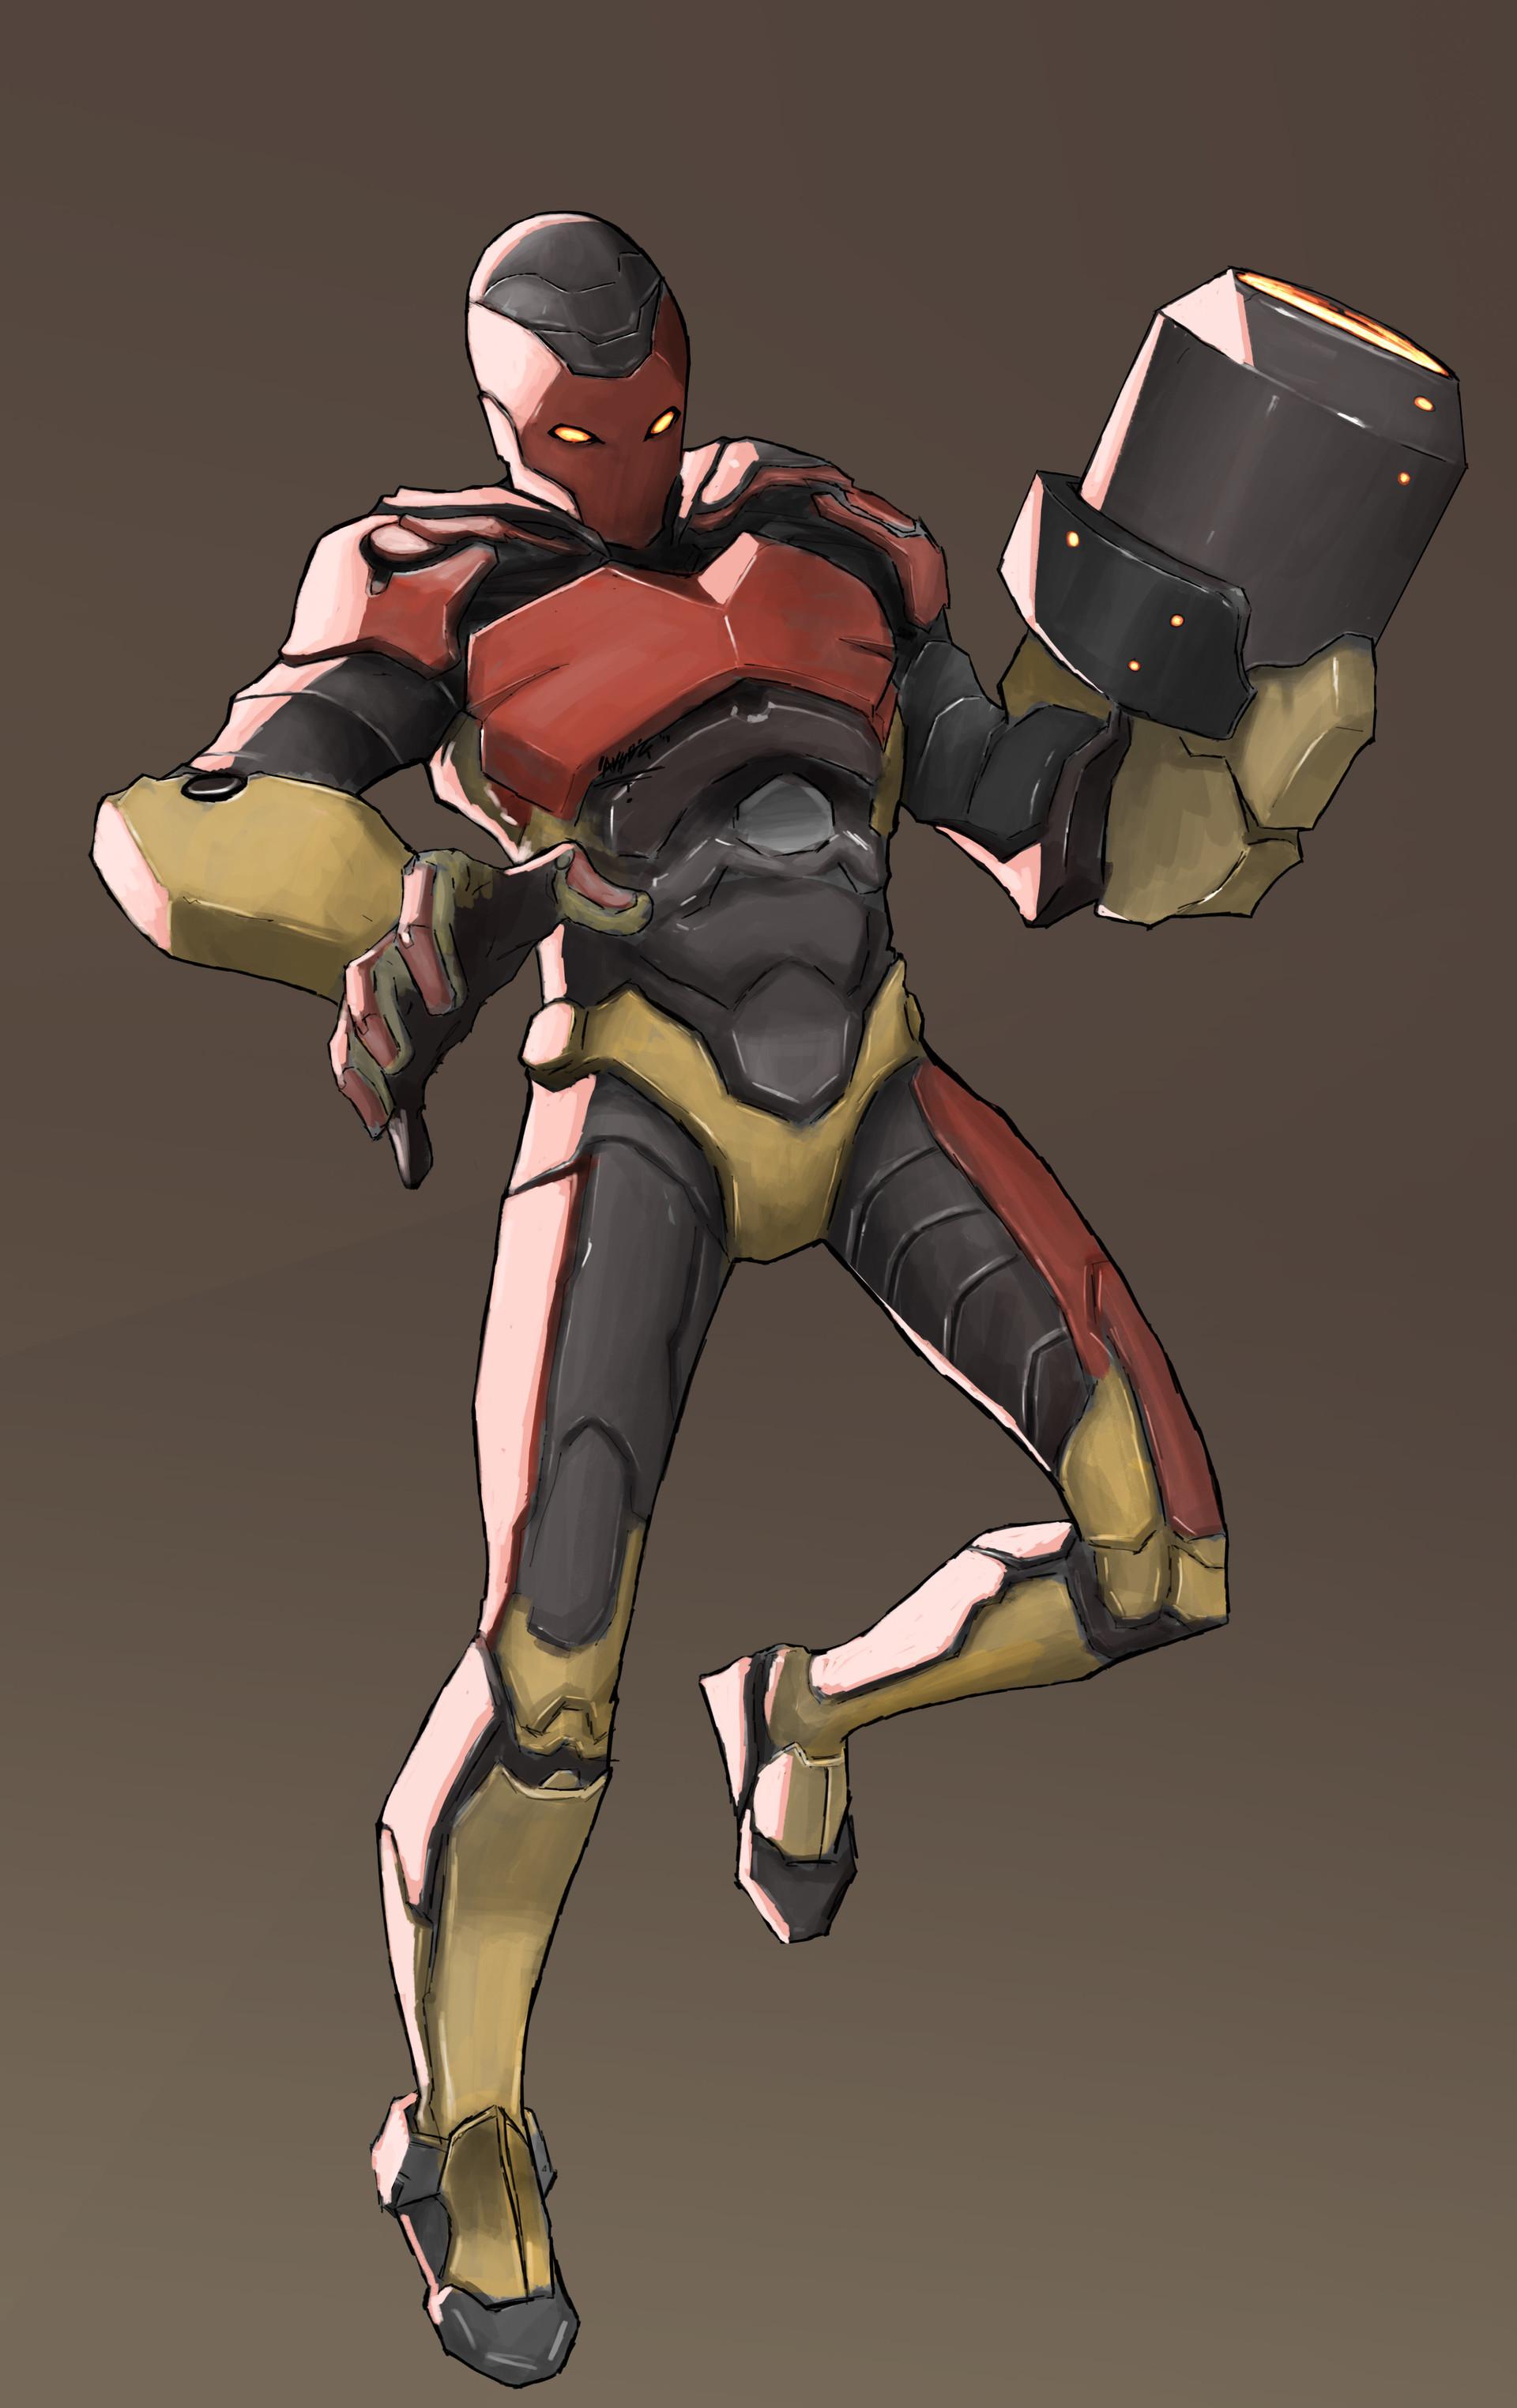 Gbenle maverick cyborg 7 6